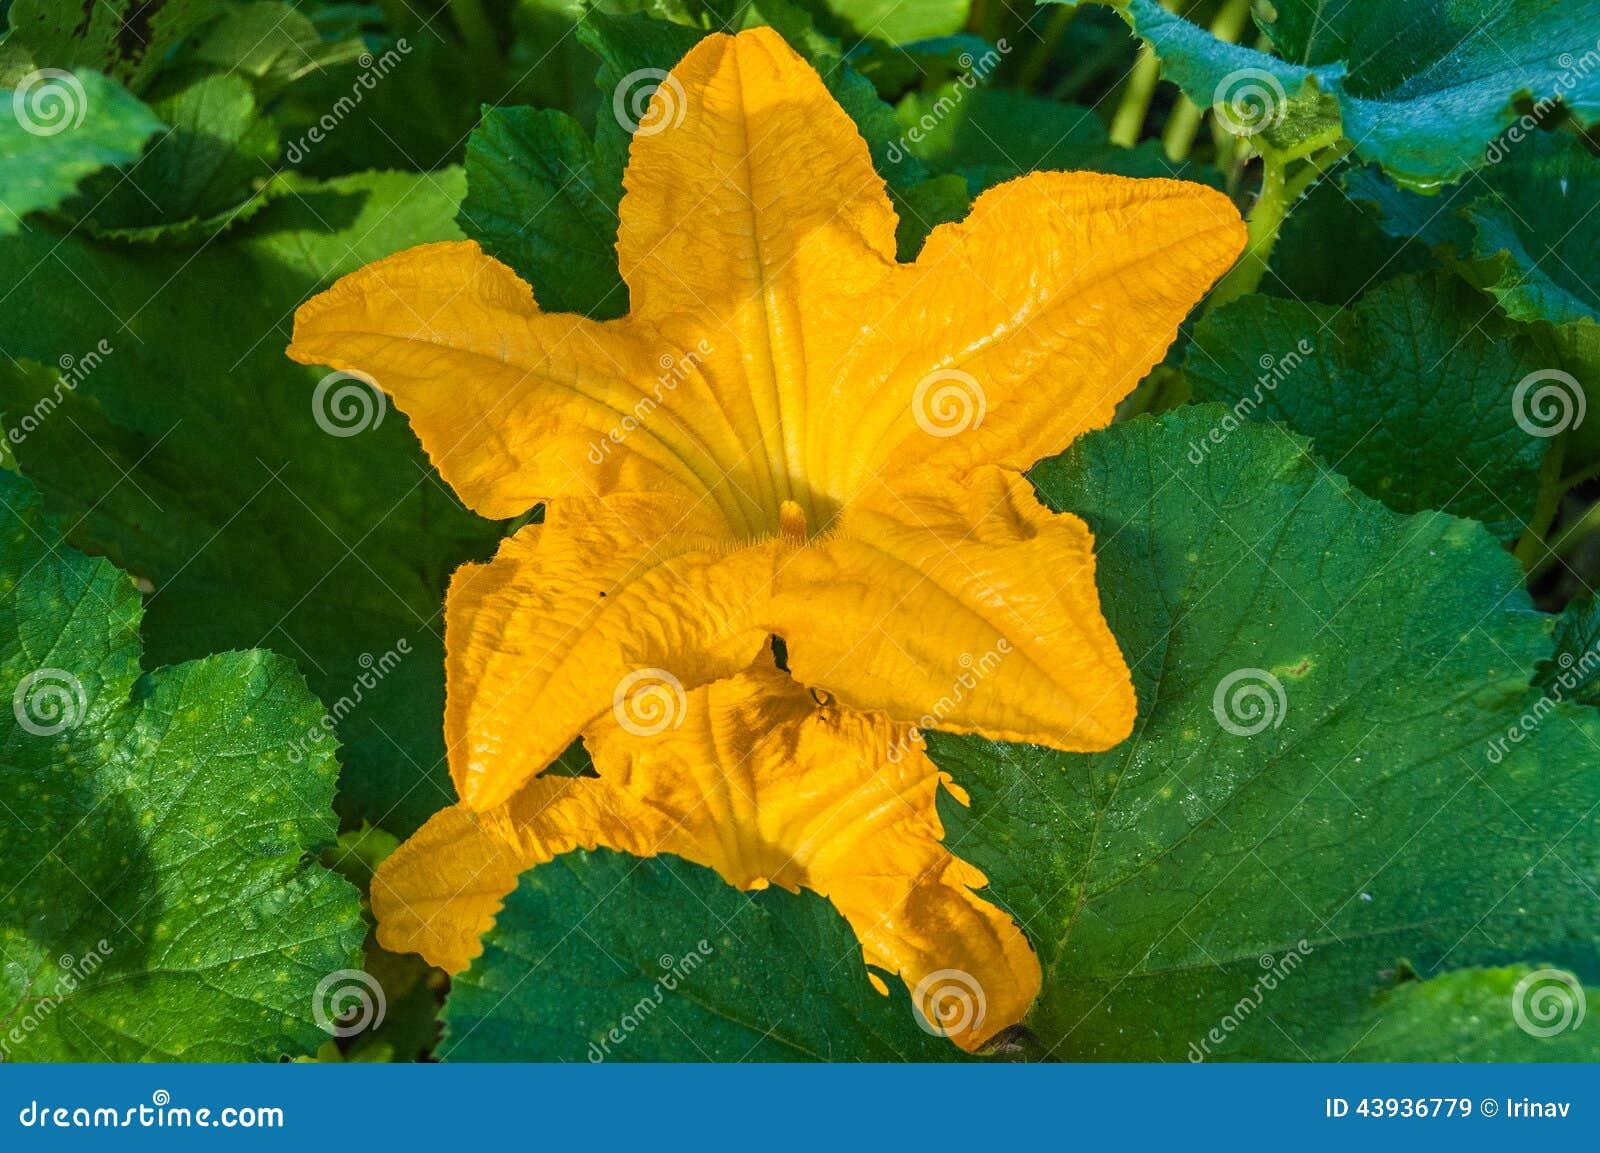 Courgette flower growing garden stock image image of leaf crops courgette flower growing garden leaf crops mightylinksfo